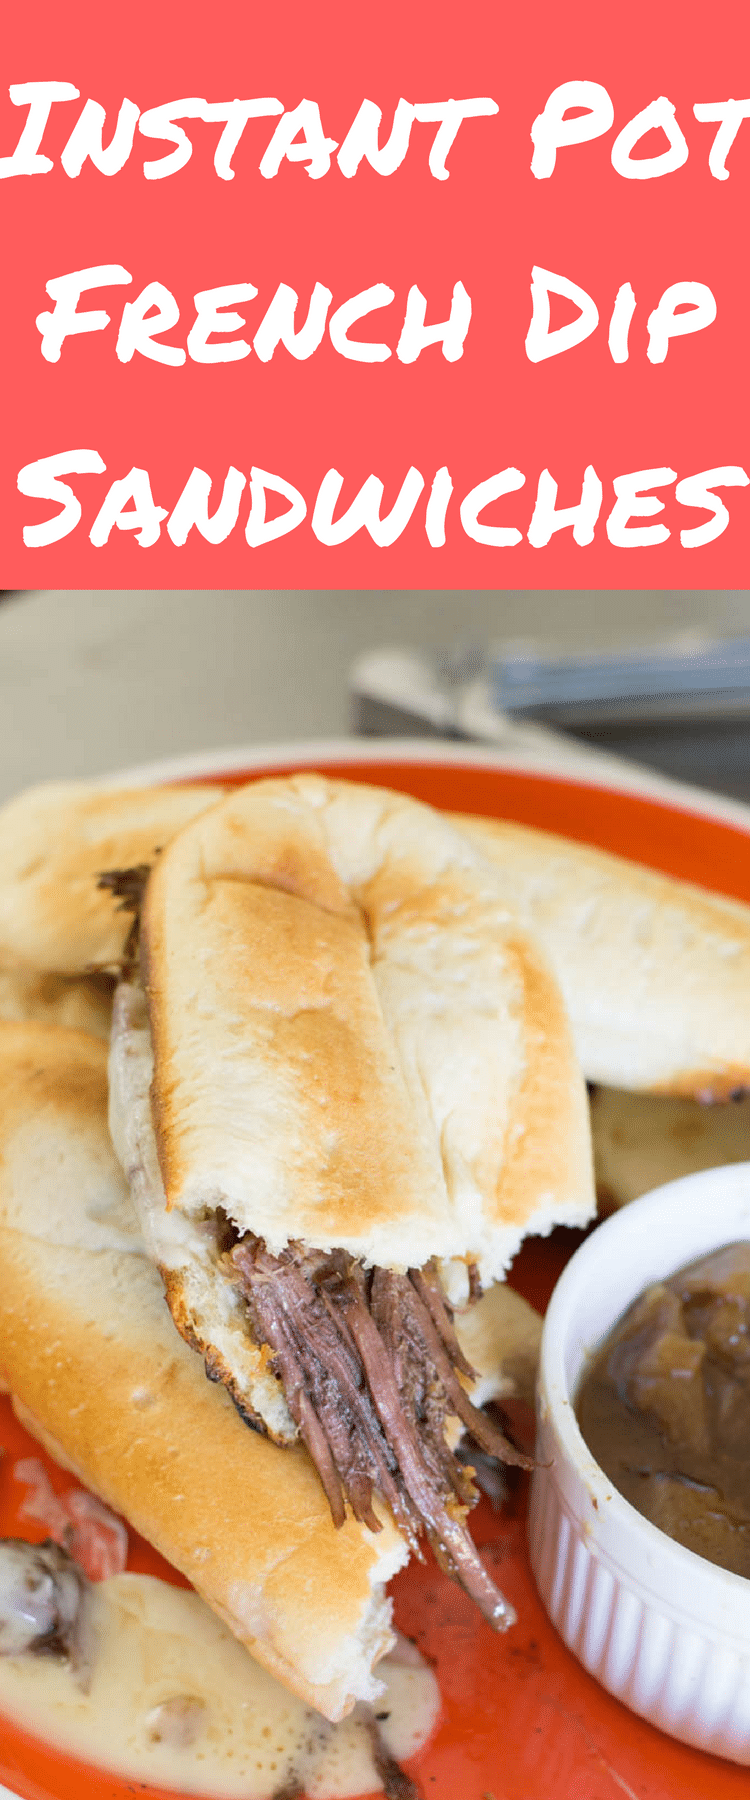 Instant Pot French Dip Sandwiches / French Dip Au Jus / Sandwich via @clarkscondensed